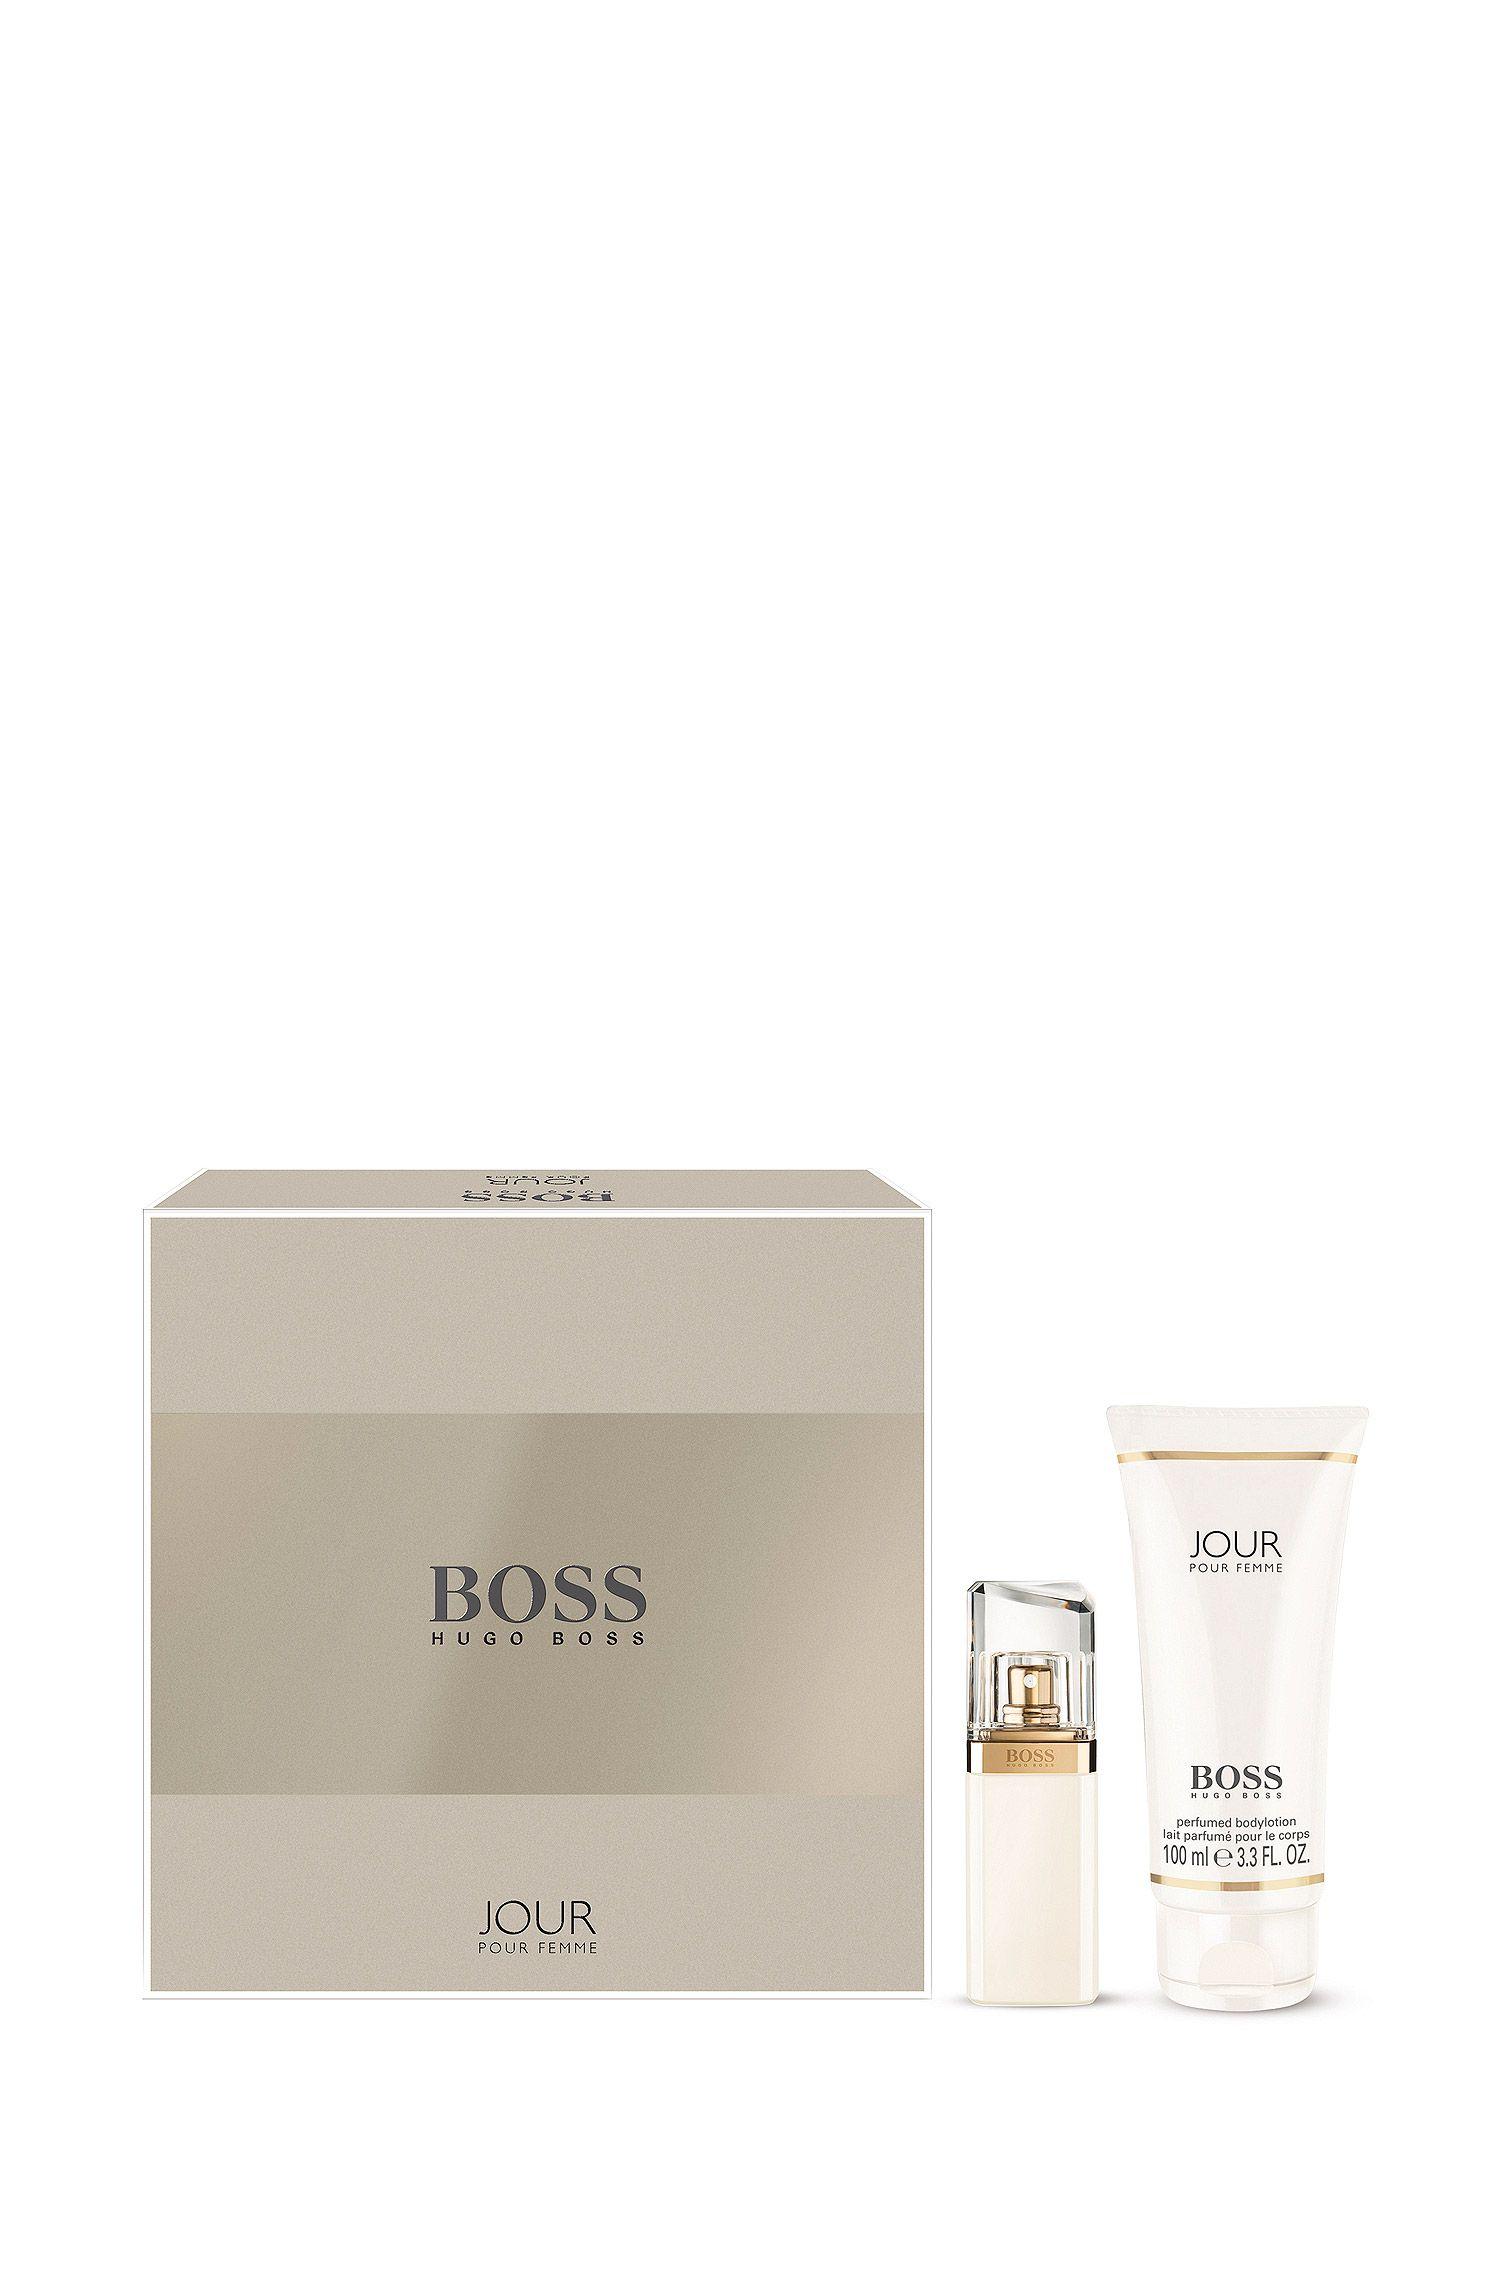 Geschenkset 'BOSS Jour' mit Eau de Parfum 30 ml und Bodylotion